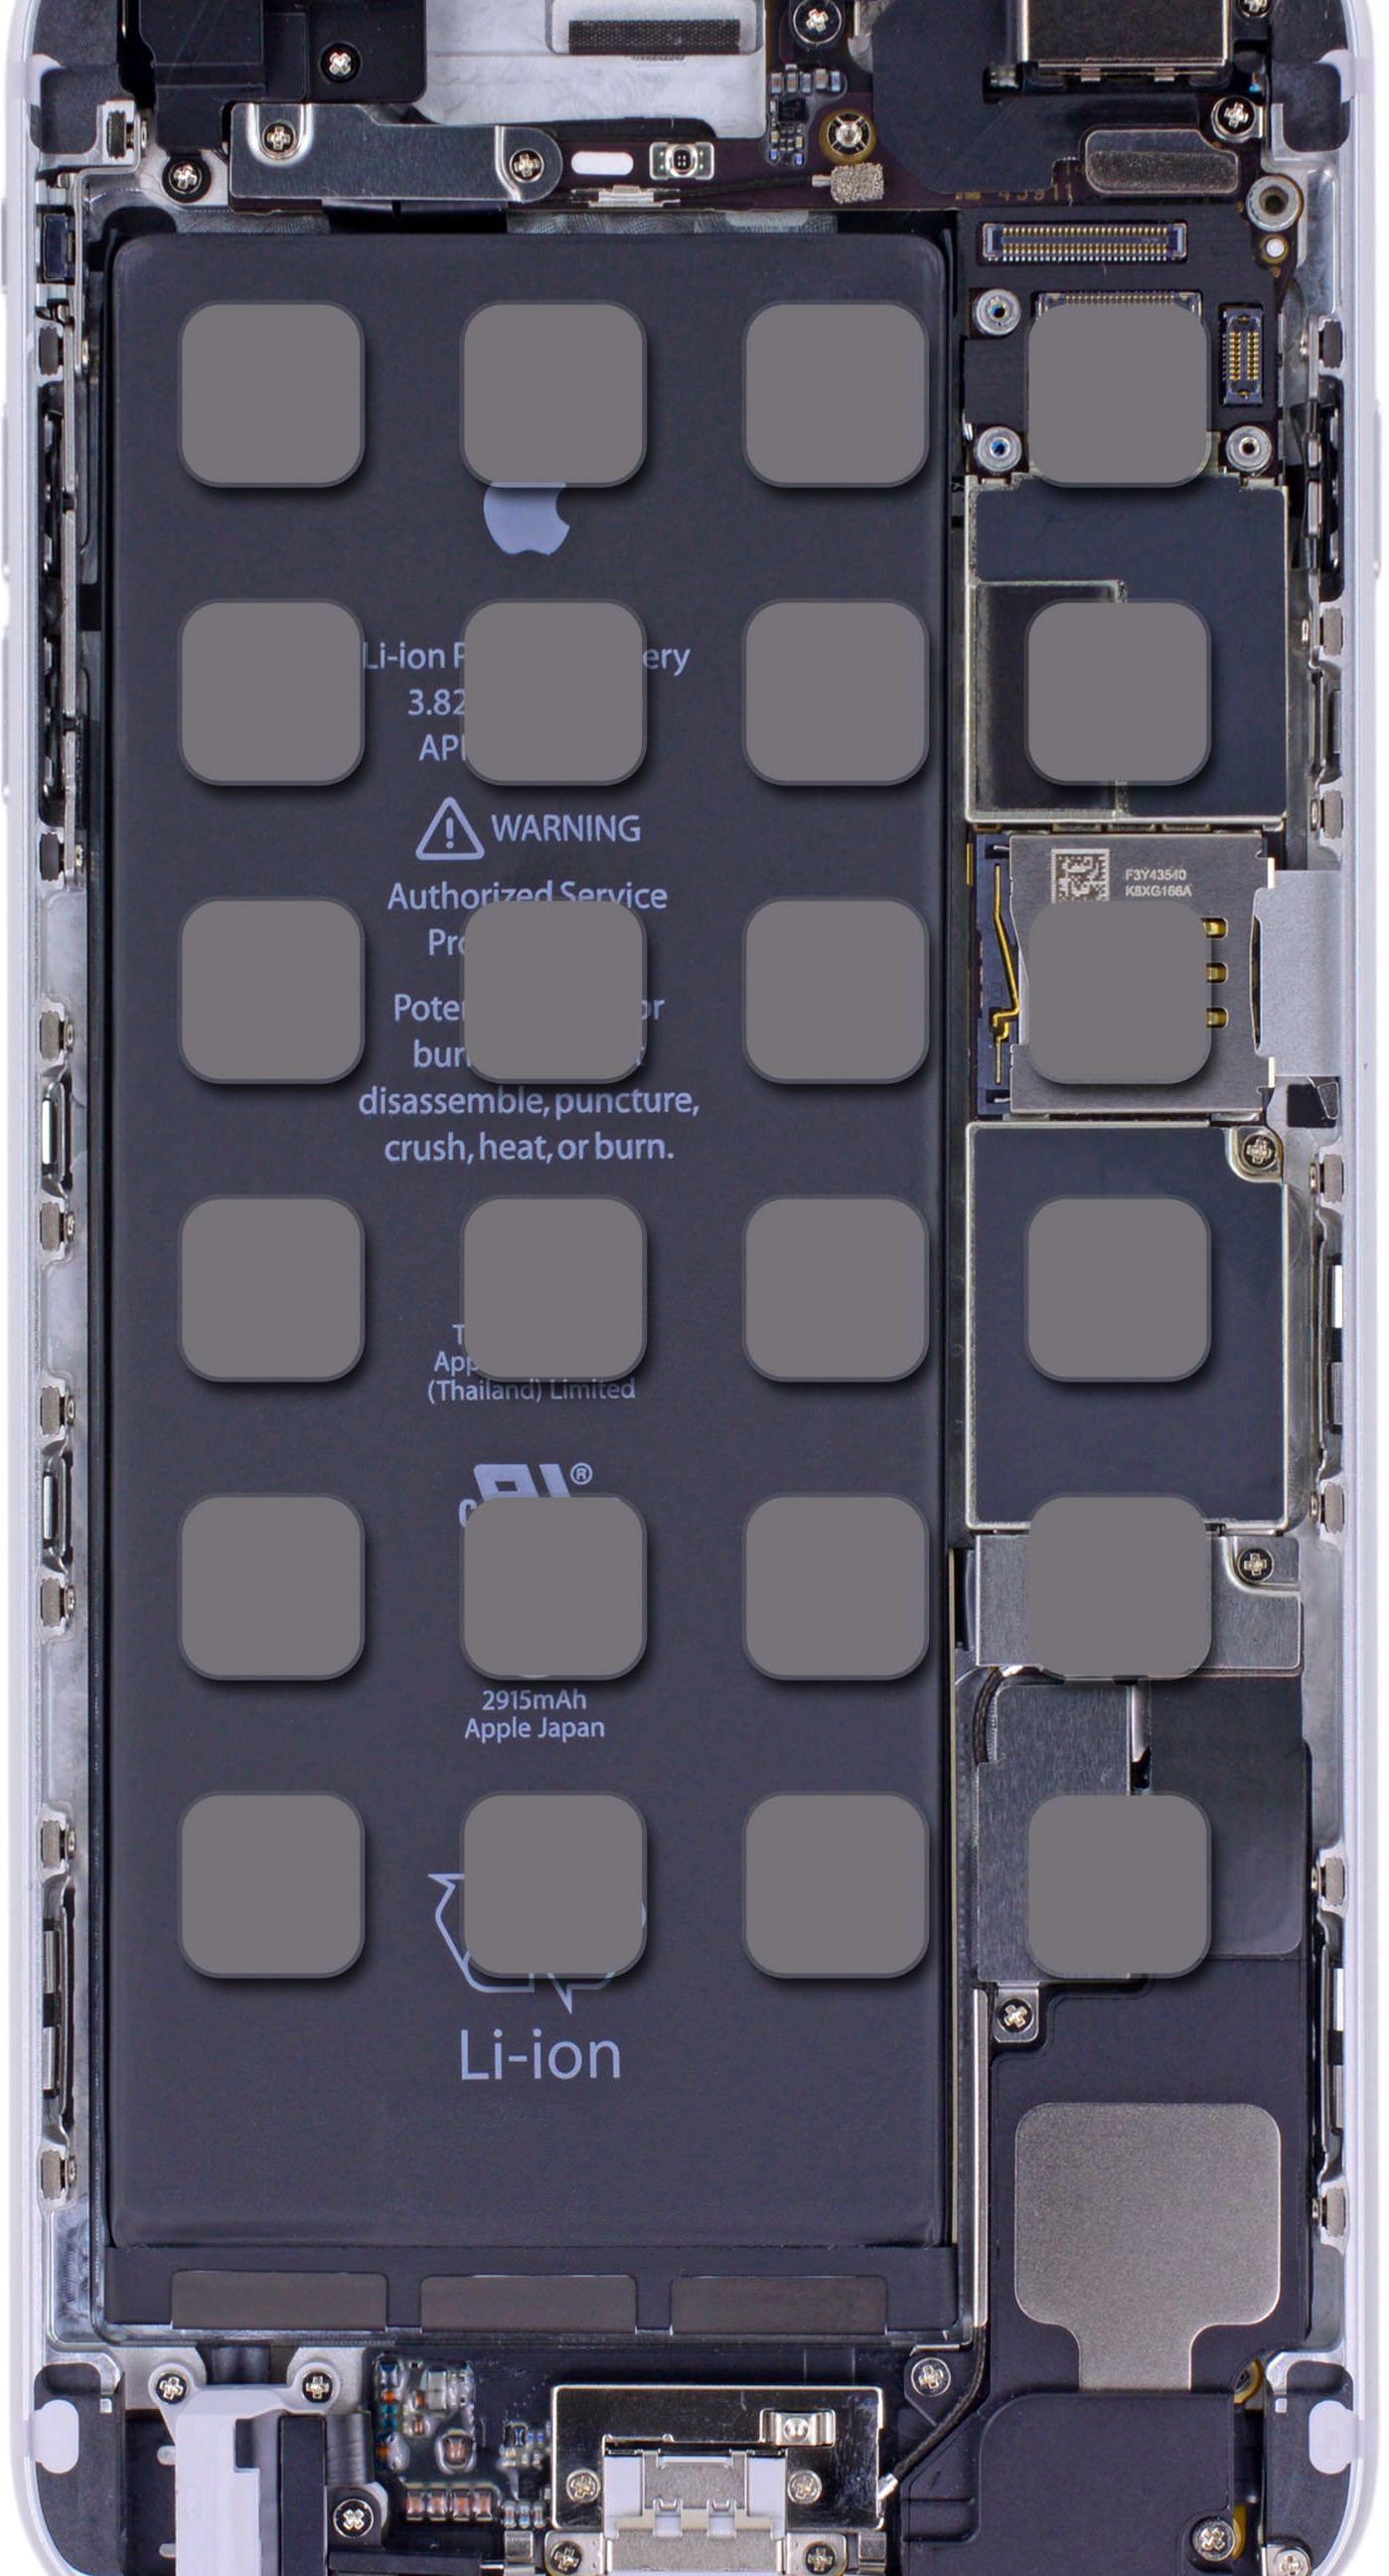 Iphone 6s Plus Iphone 6 Plus 壁紙 Iphone6 壁紙 6s 壁紙